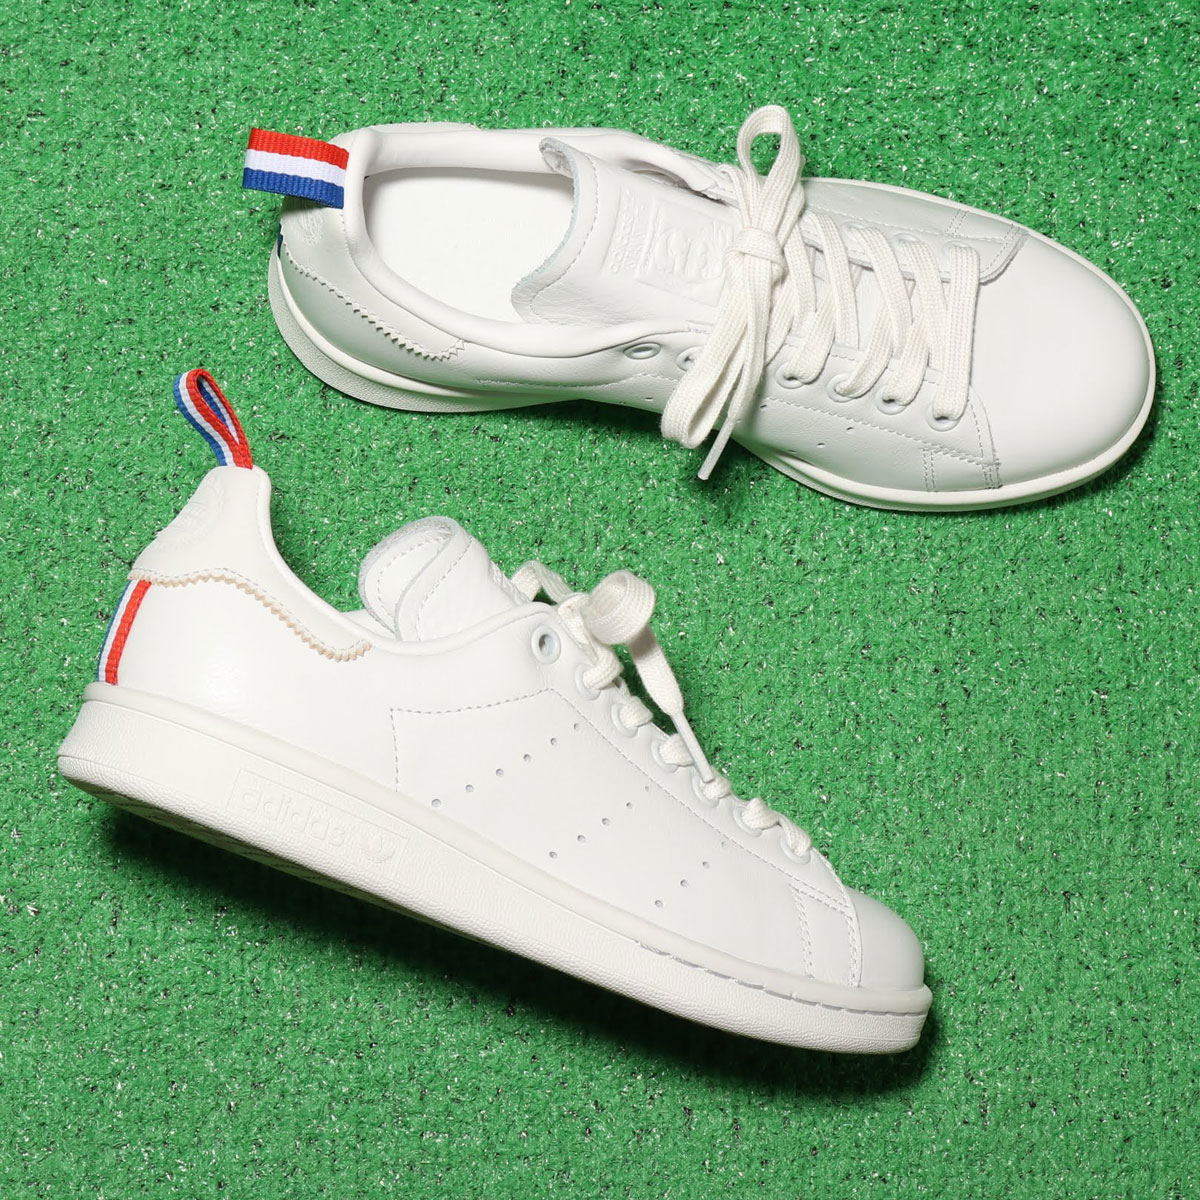 adidas Originals STAN SMITH (アディダスオリジナルス スタンスミス)CRYSTAL WHITE/FTWR WHITE/SCARLET【メンズ レディース スニーカー】19SS-I